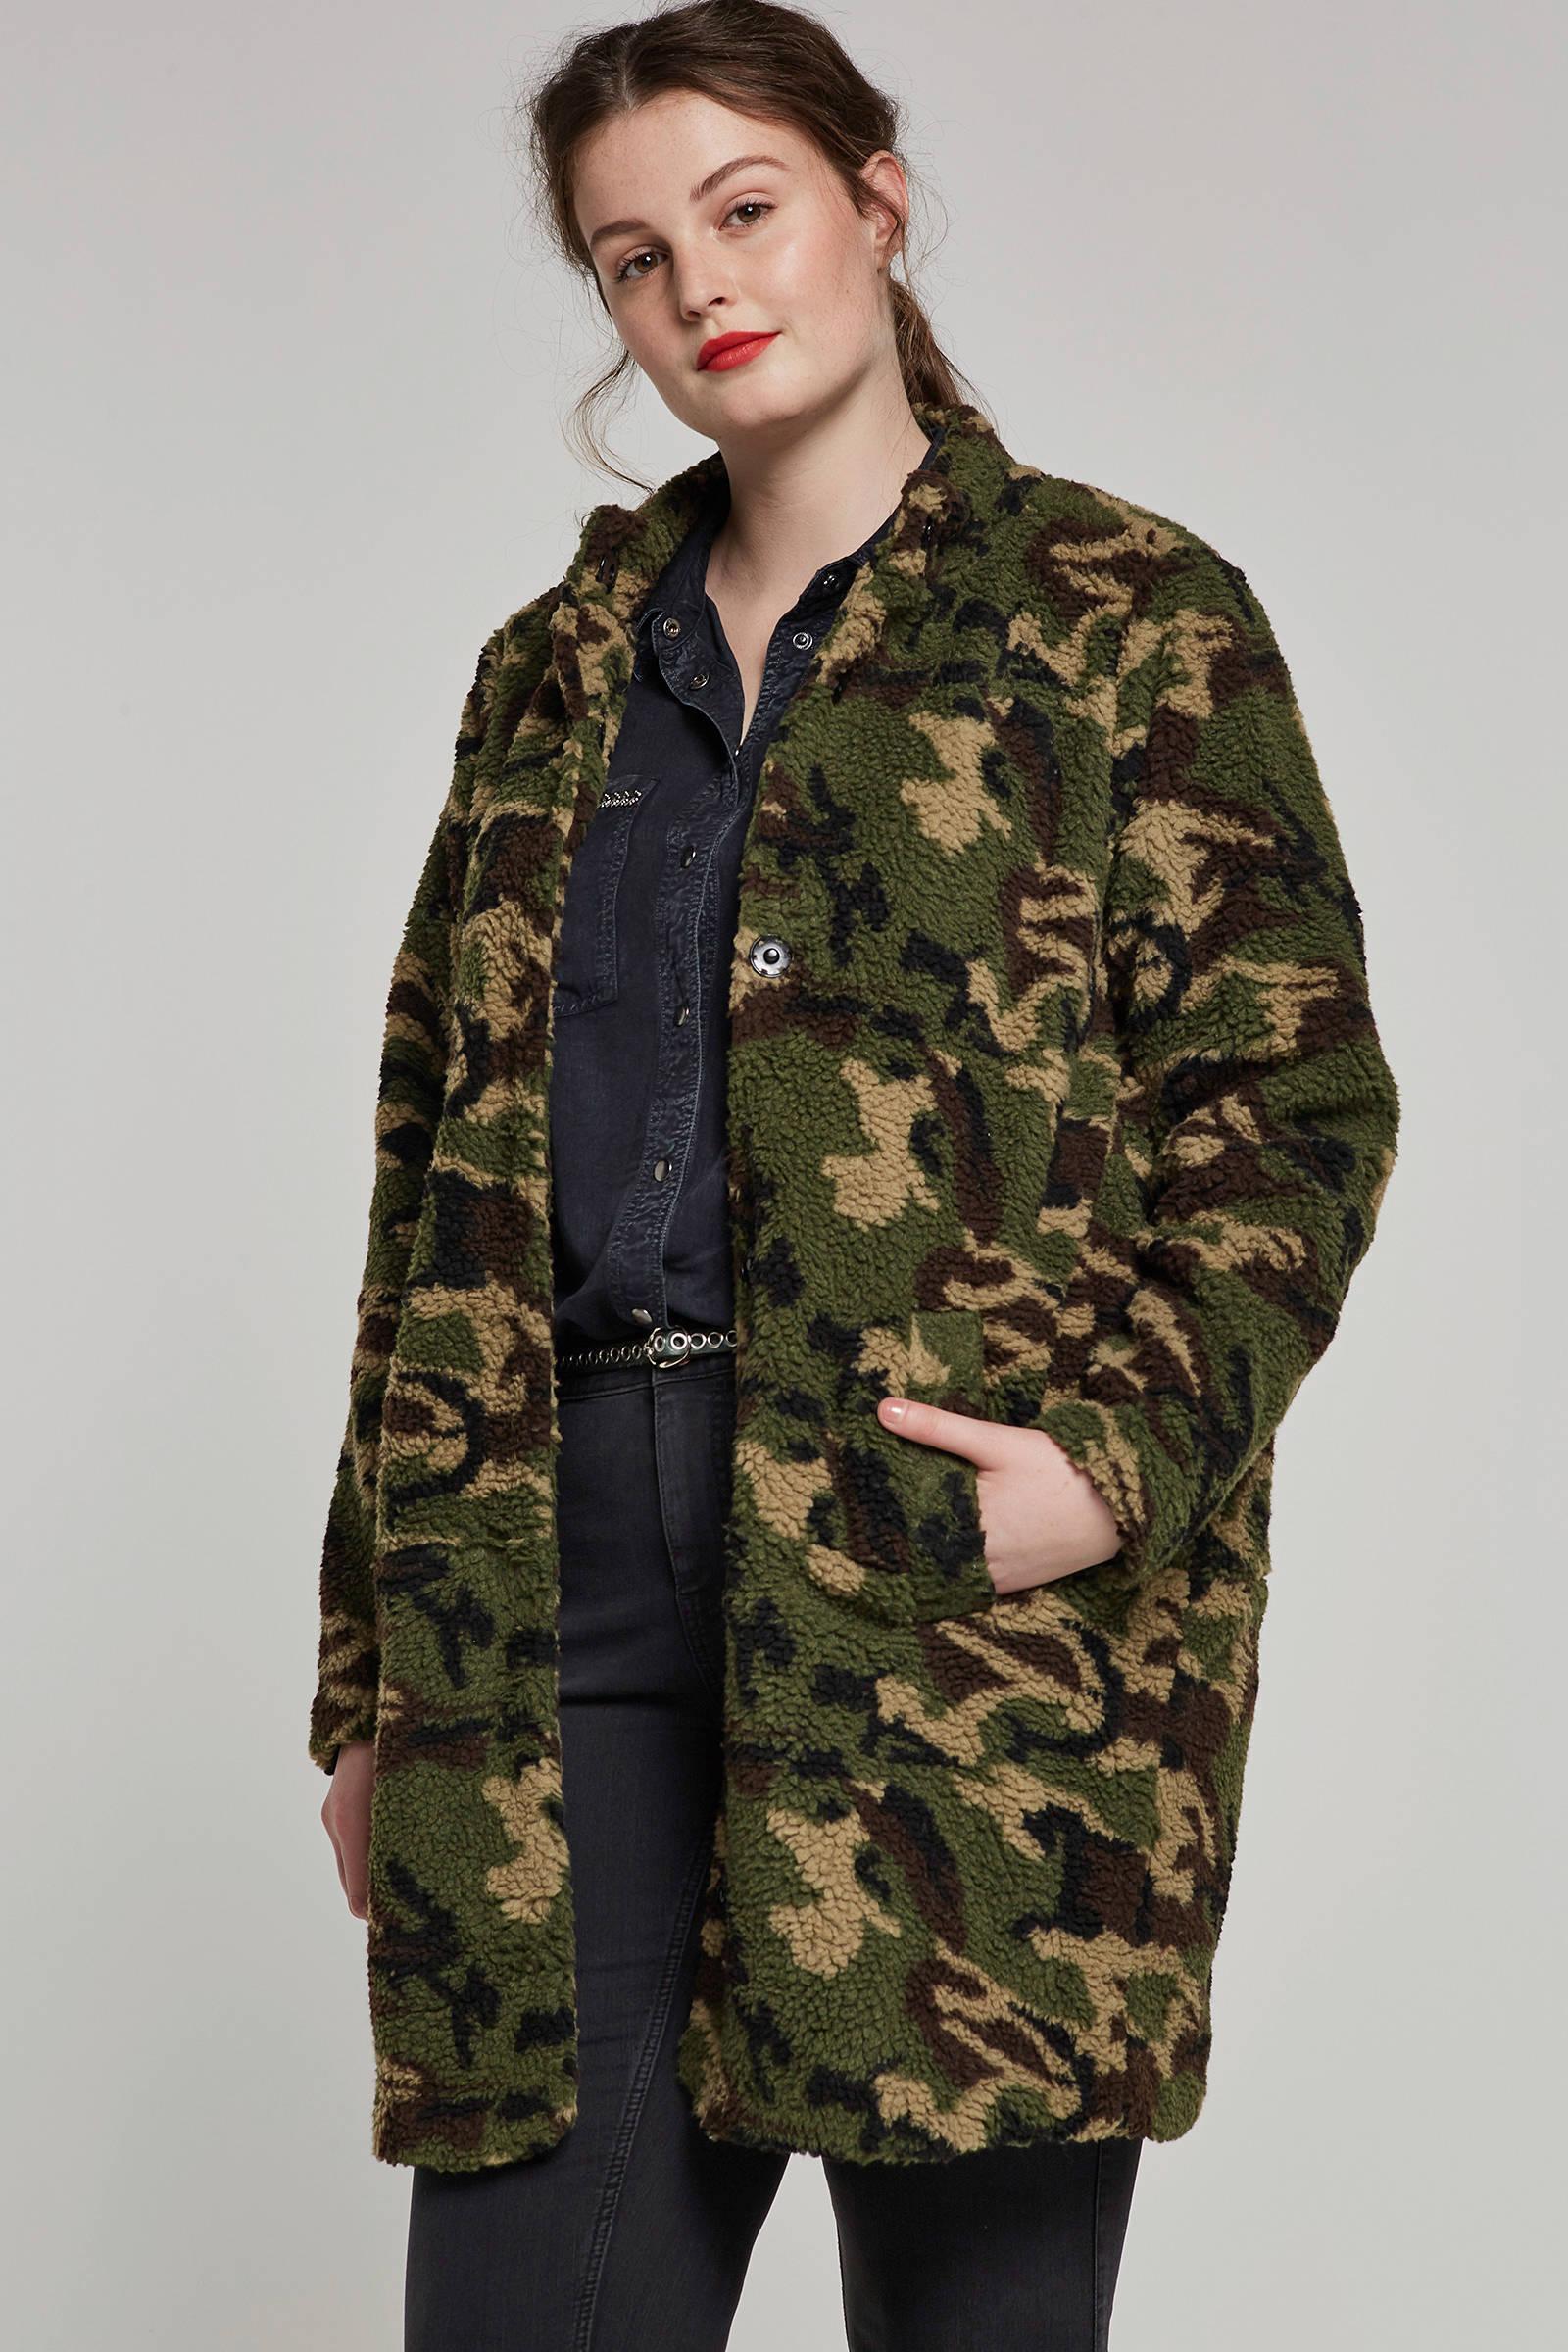 Met Jas Print Teddy Zizzi Camouflage YIf6yb7gv